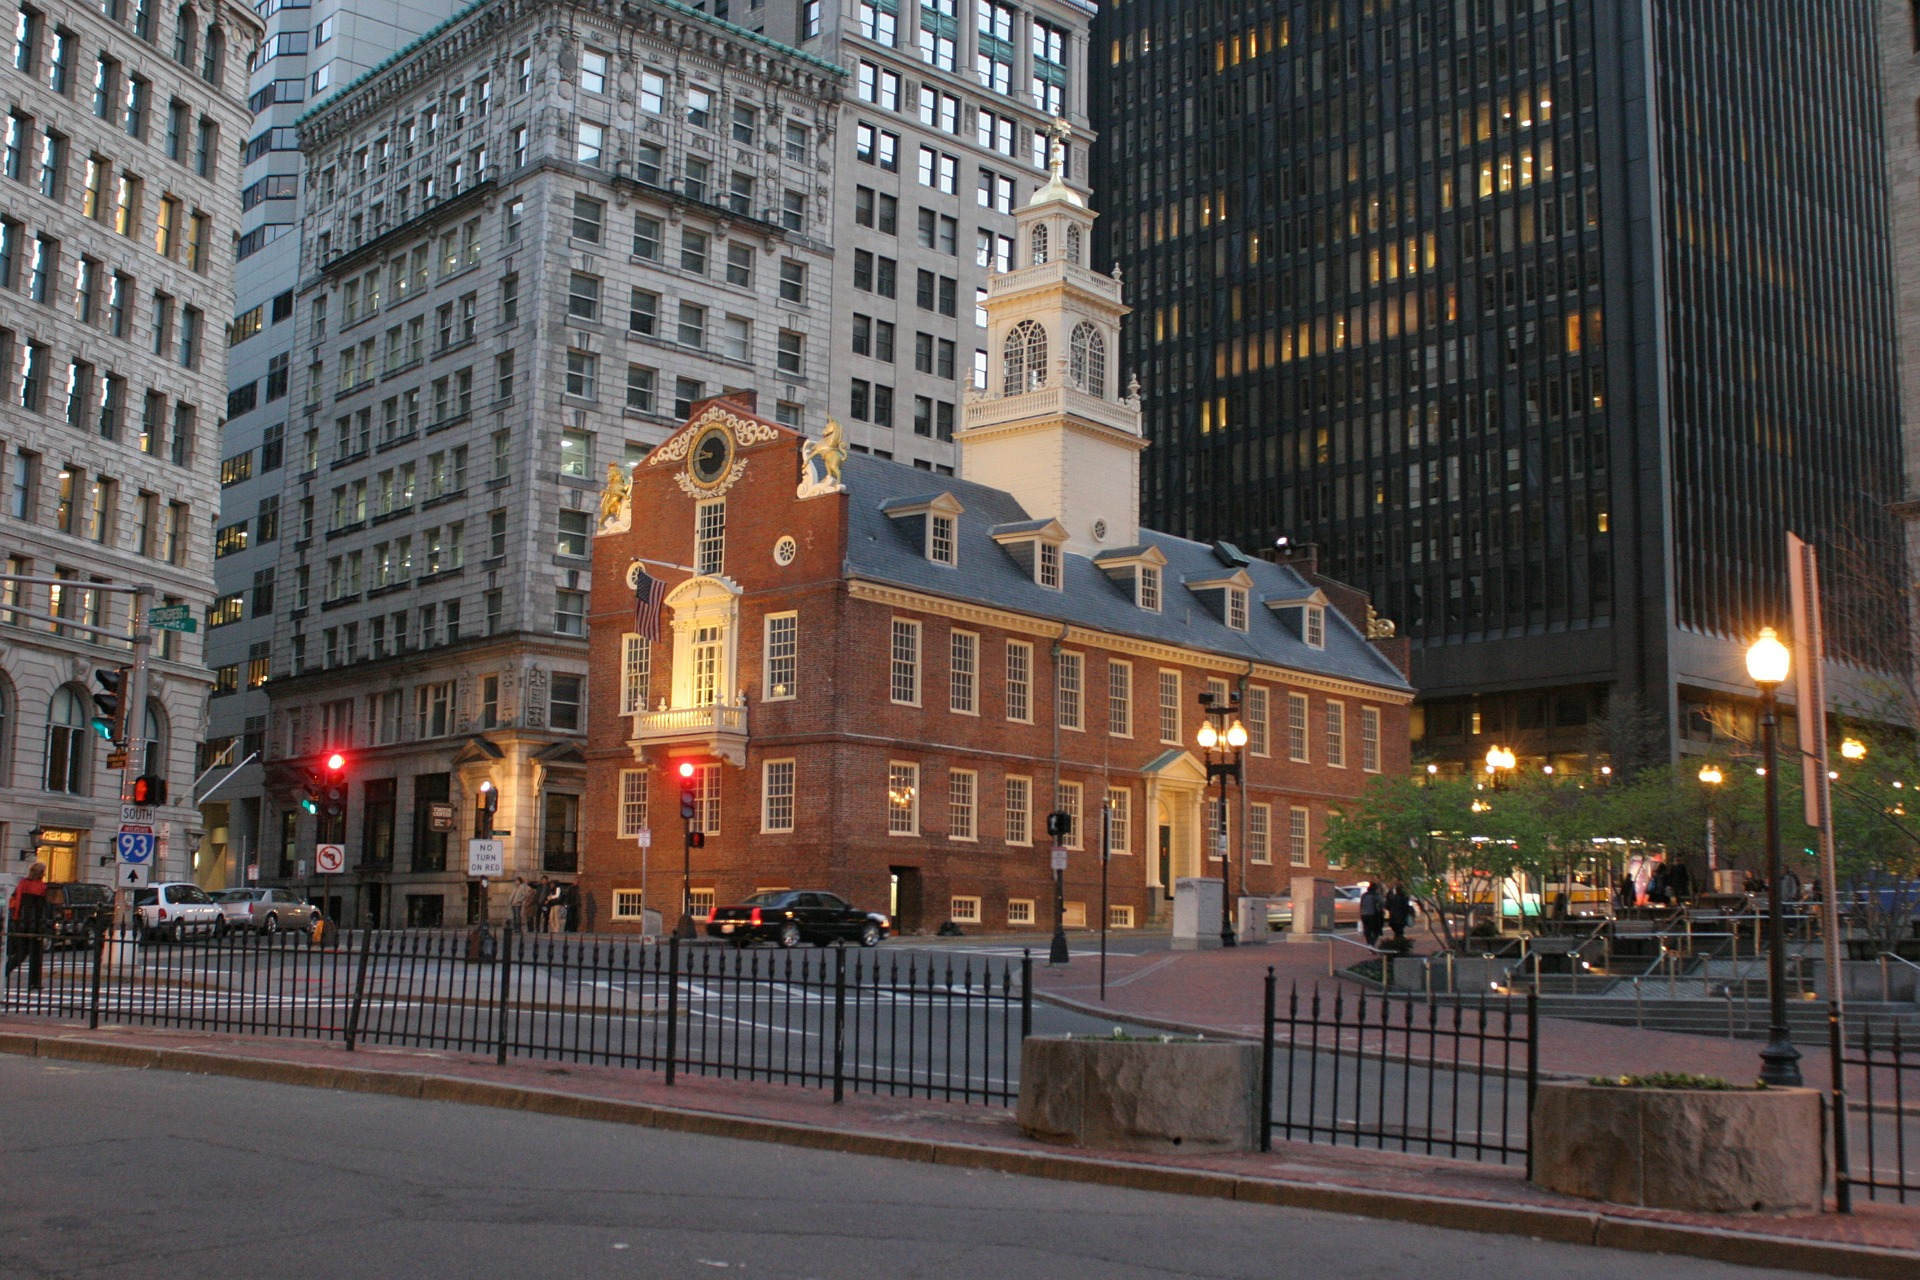 https://pixabay.com/en/boston-old-state-house-twilight-583079/